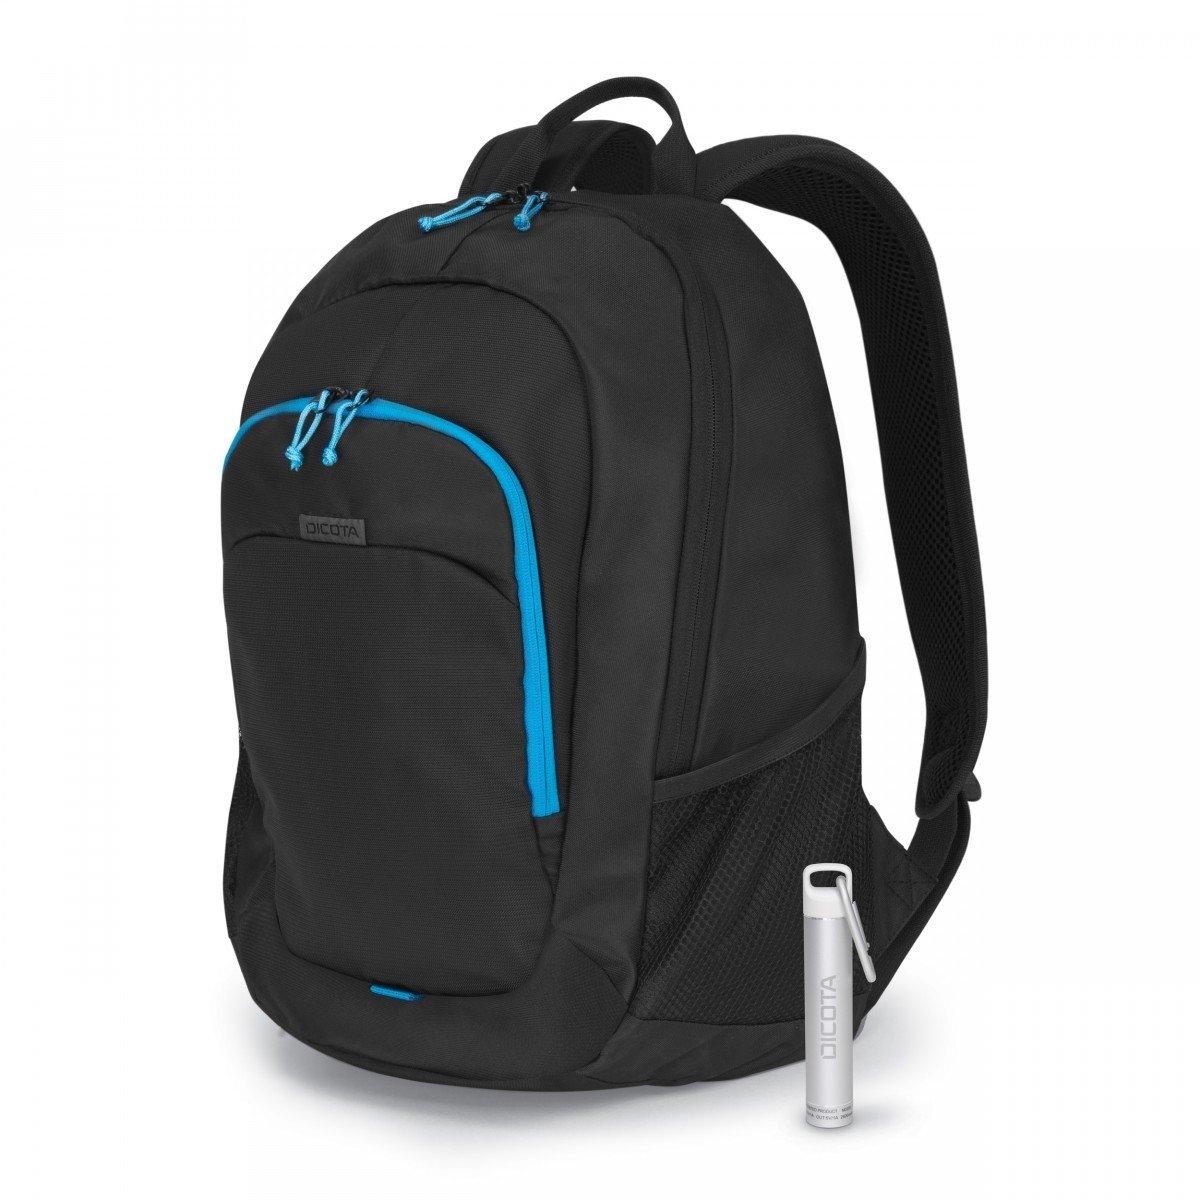 "Batoh na notebook Dicota Backpack Power Kit Value, 14"" až 15.6"", černý D31120"